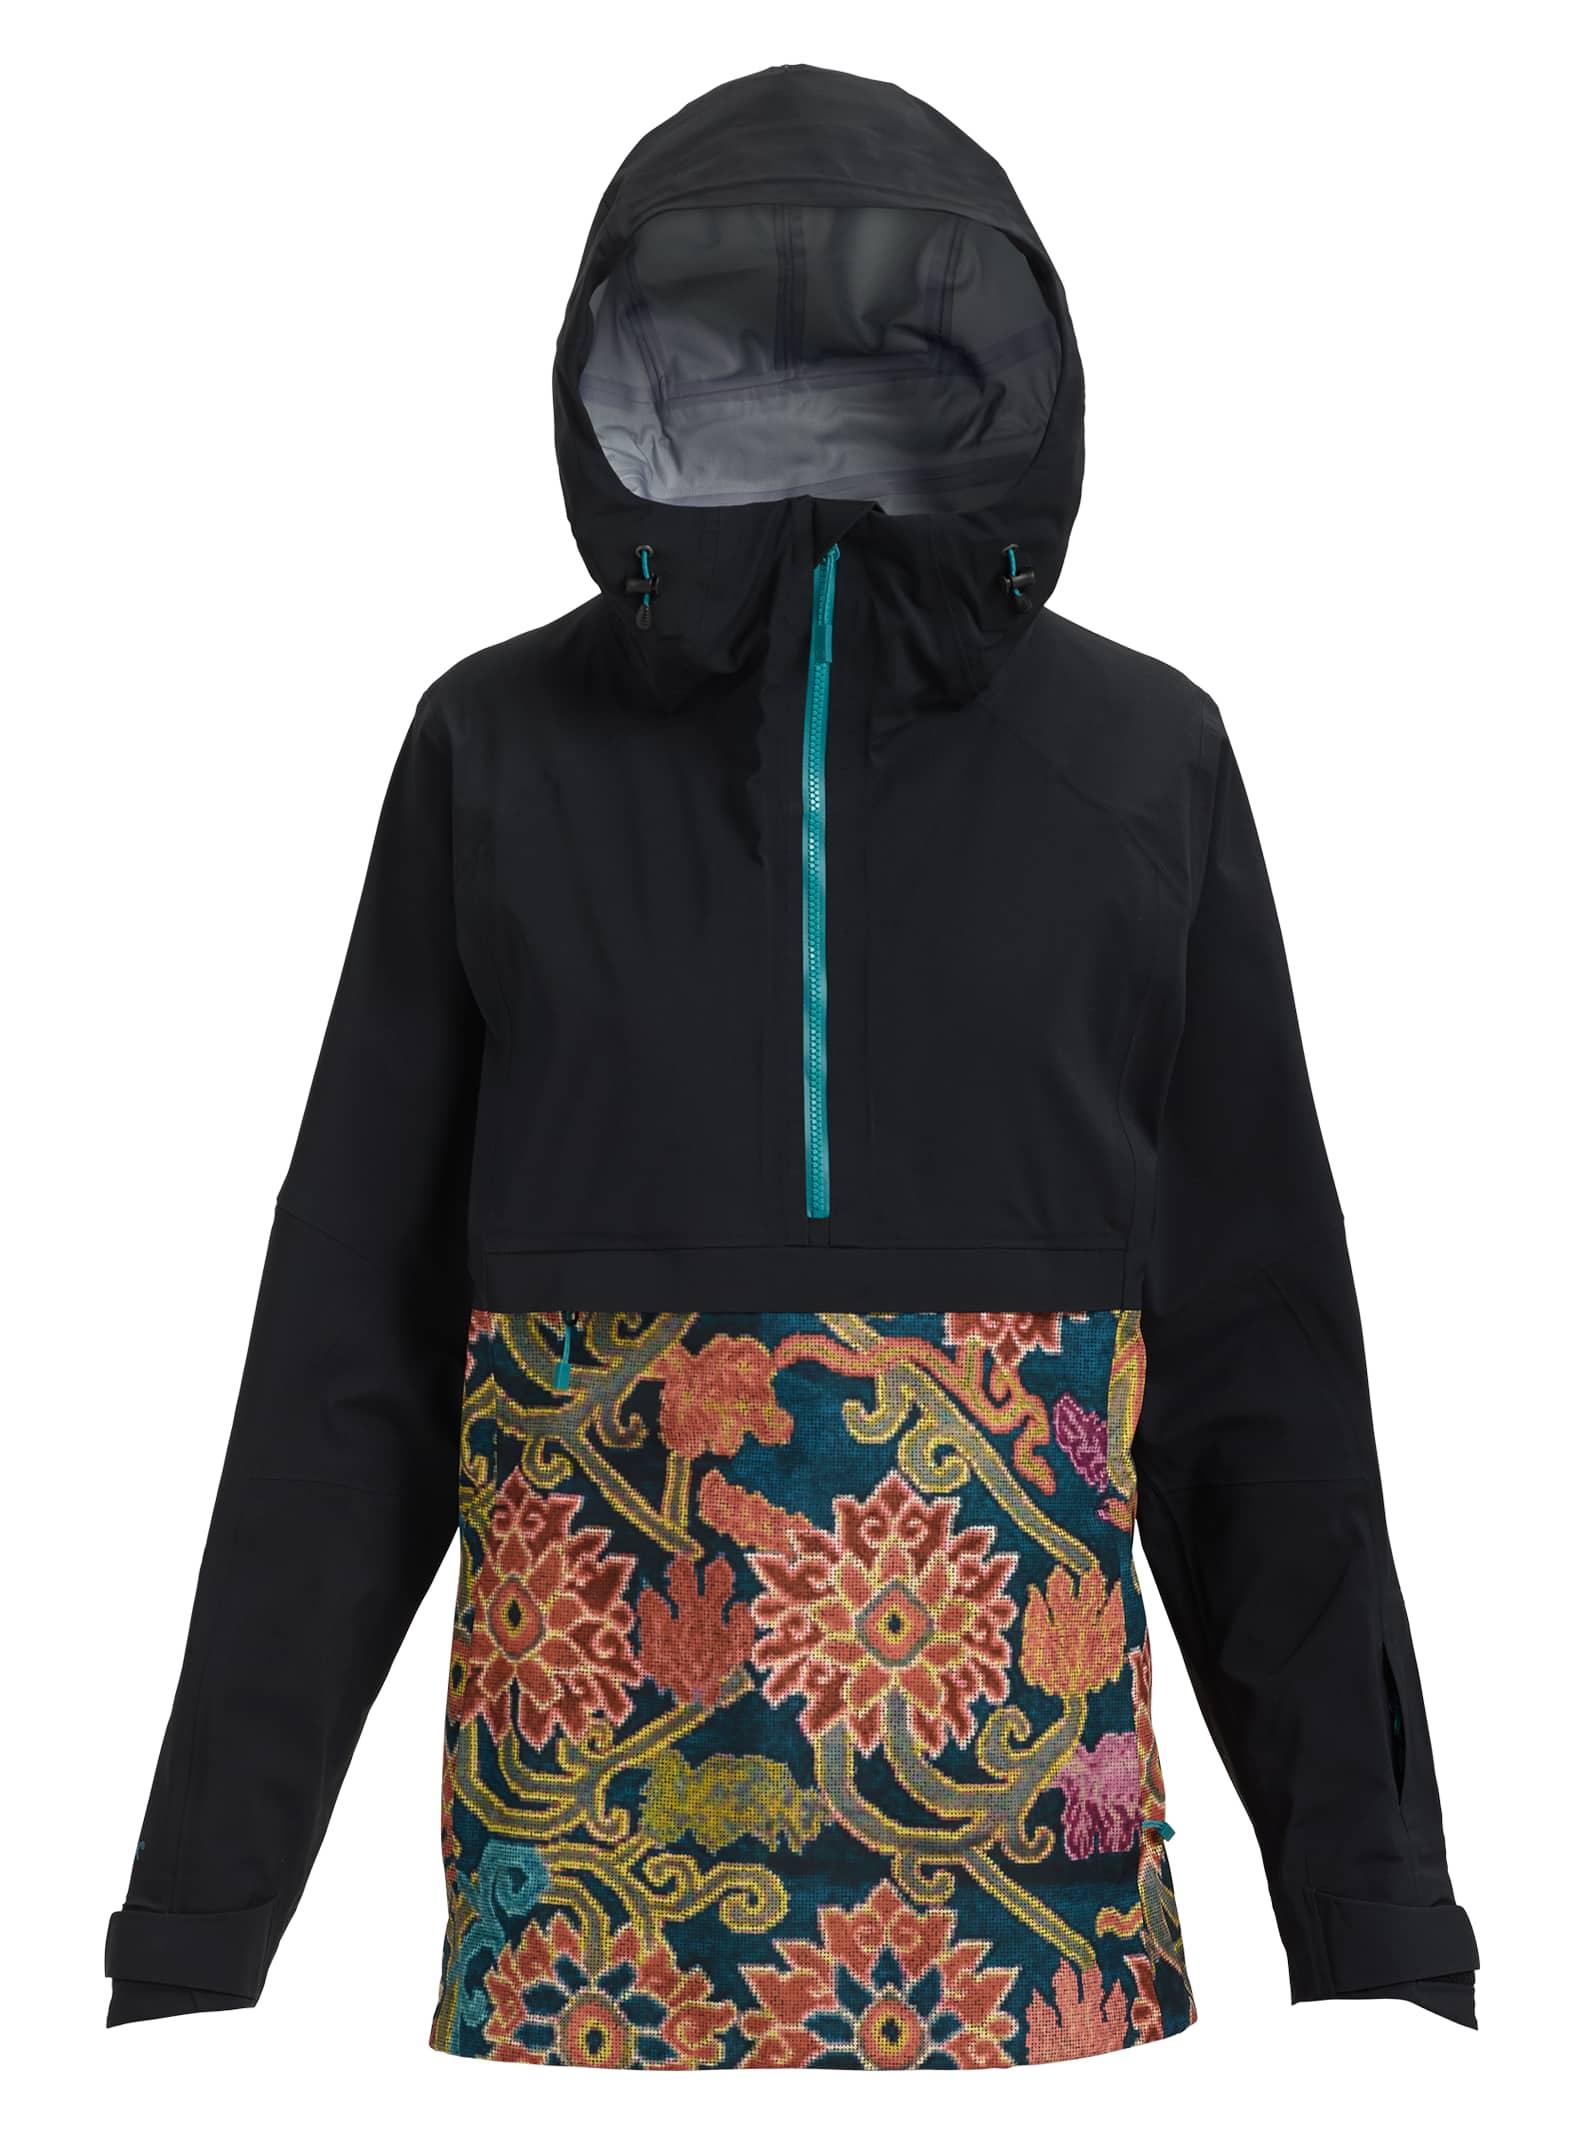 287eecd6b16 Women's Snowboard Jackets | Burton Snowboards